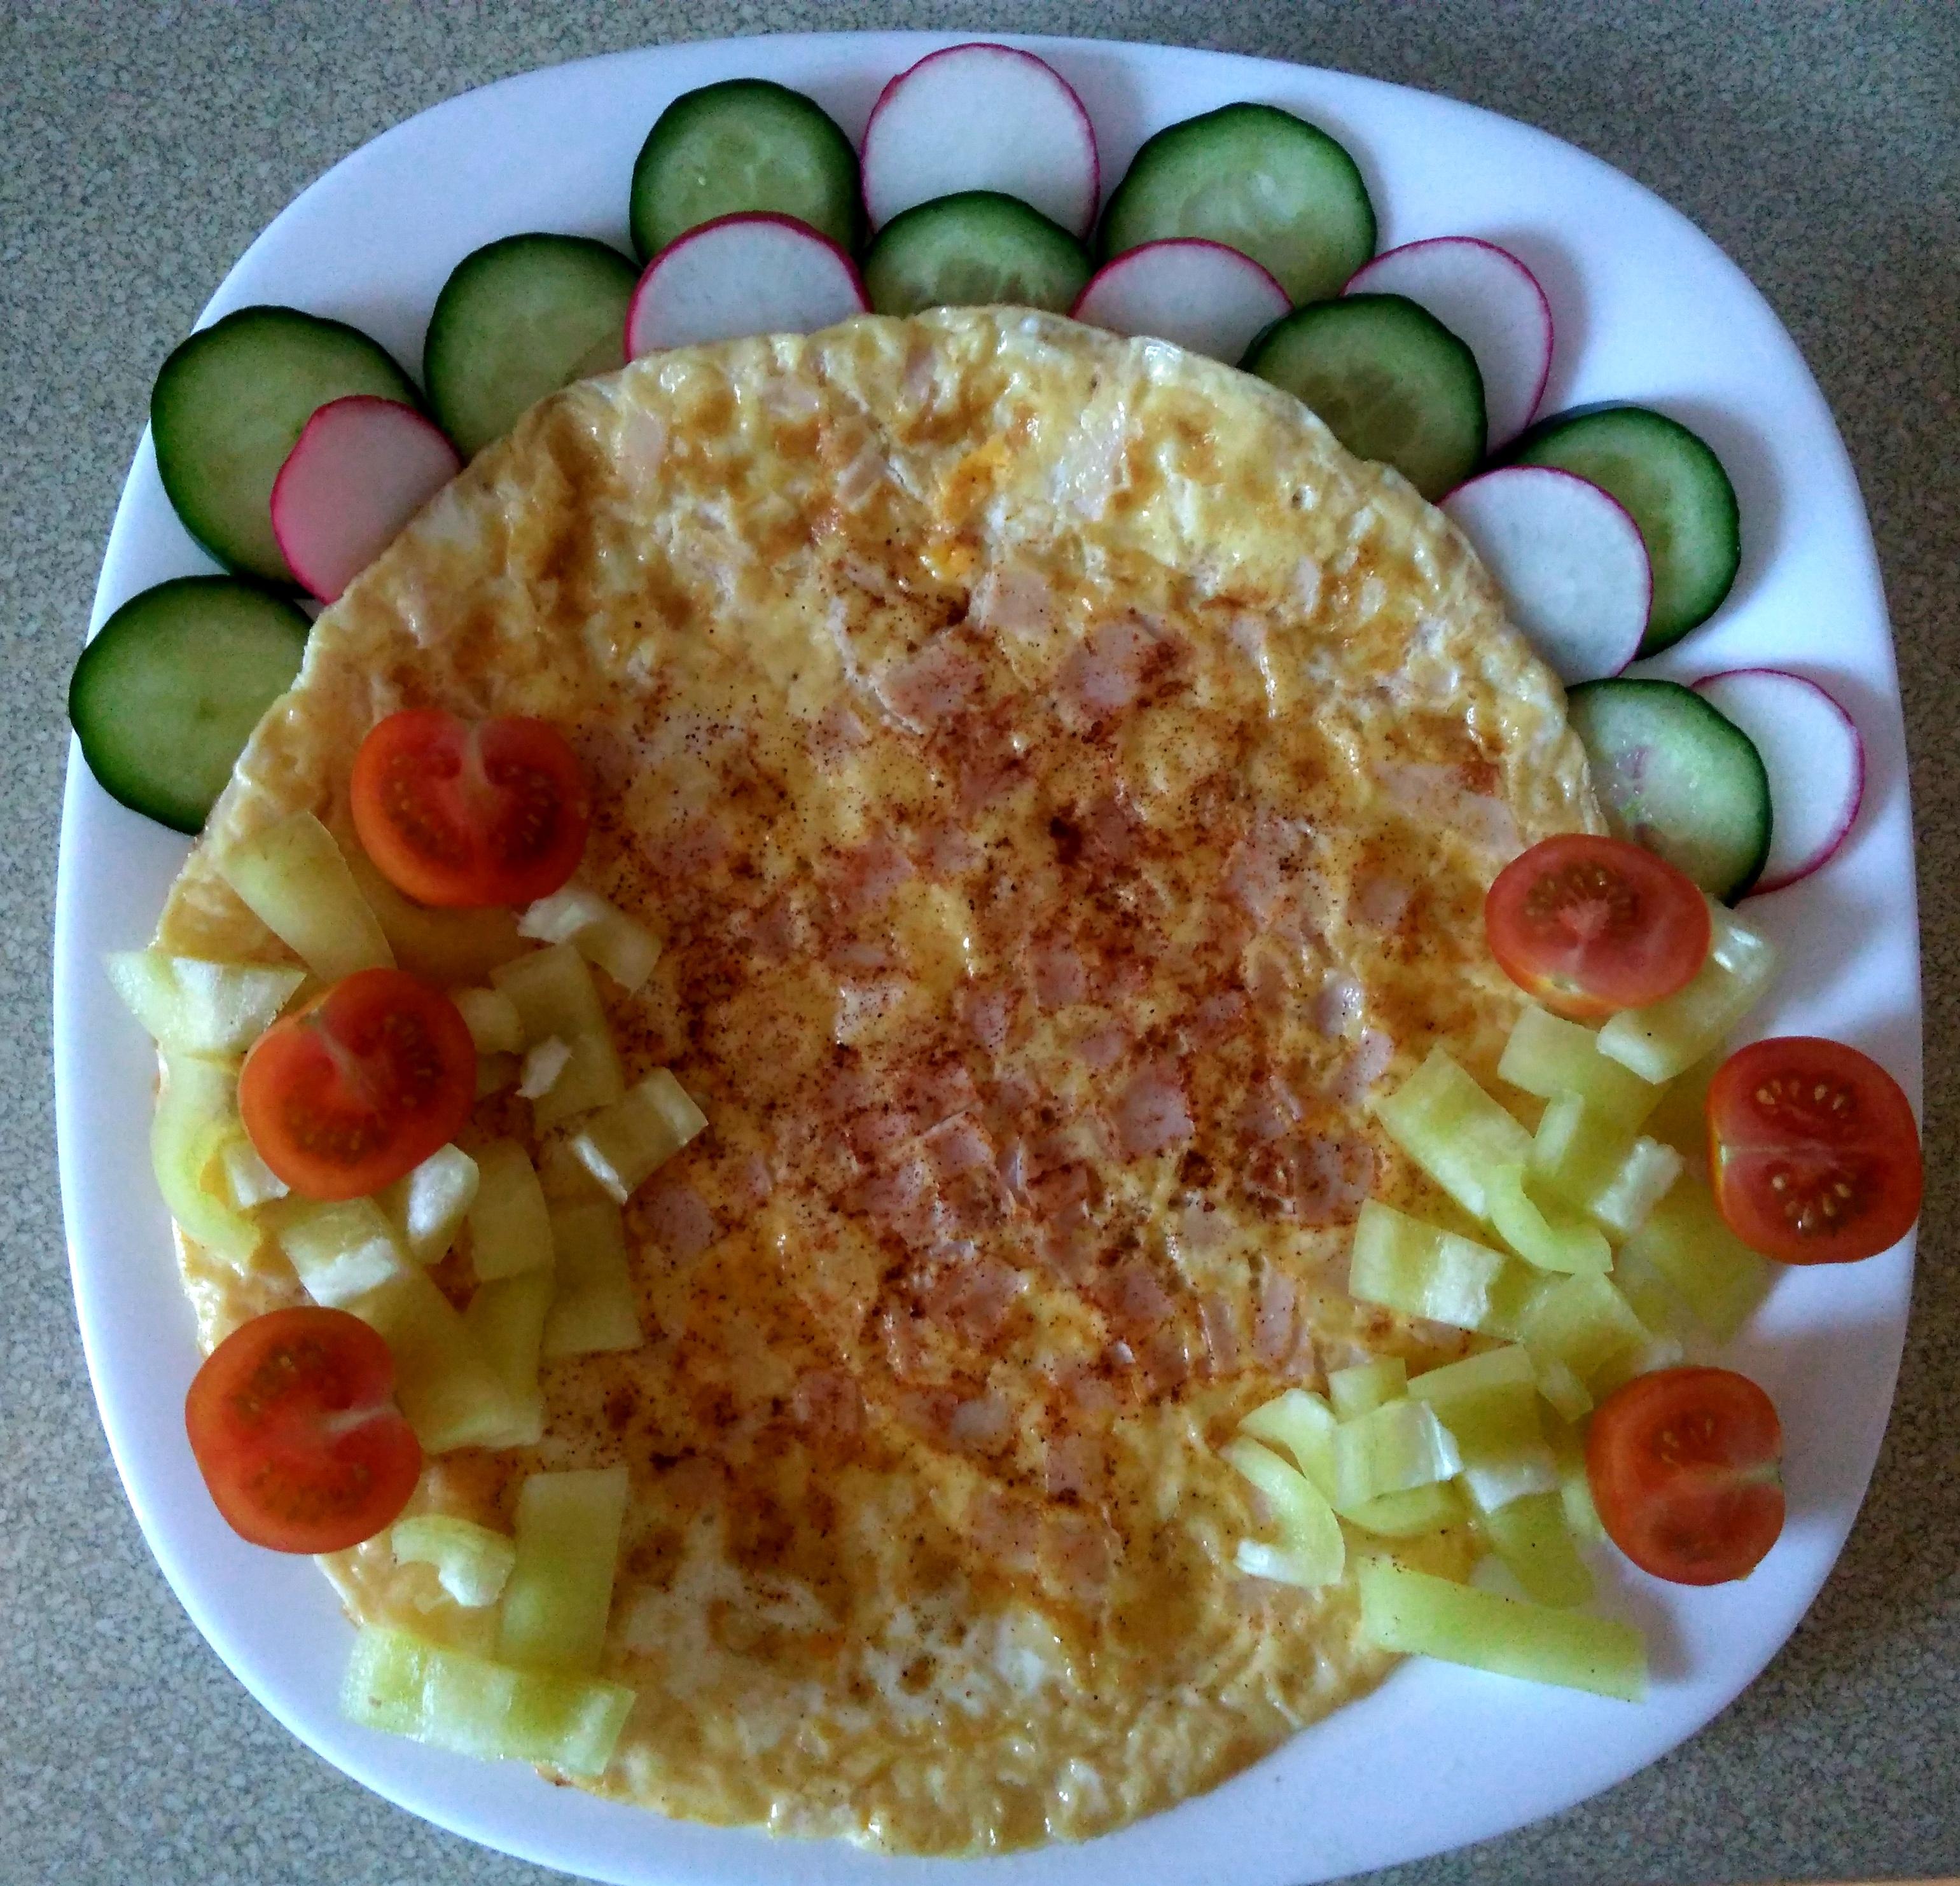 Zdravá raňajková zeleninová omeleta